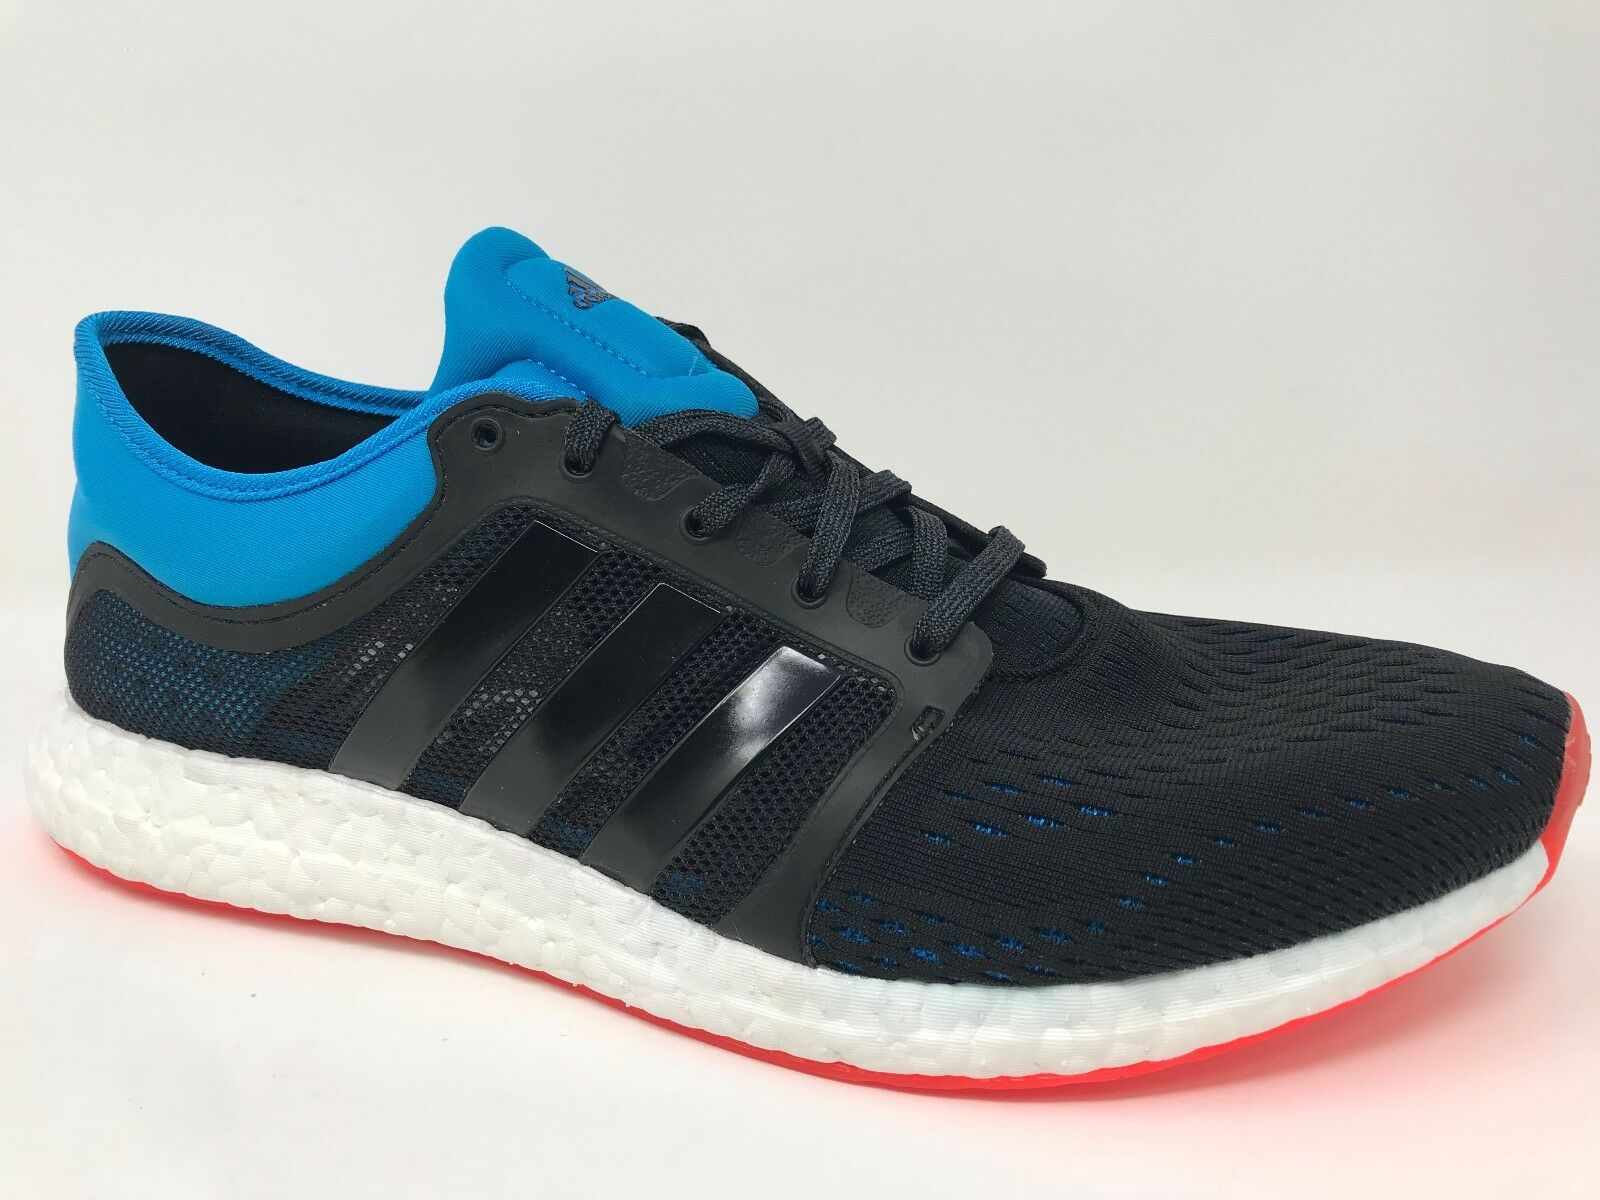 New! Men's adidas B25275 ClimaChill Rocket Boost Running Shoes Black/Blue C62